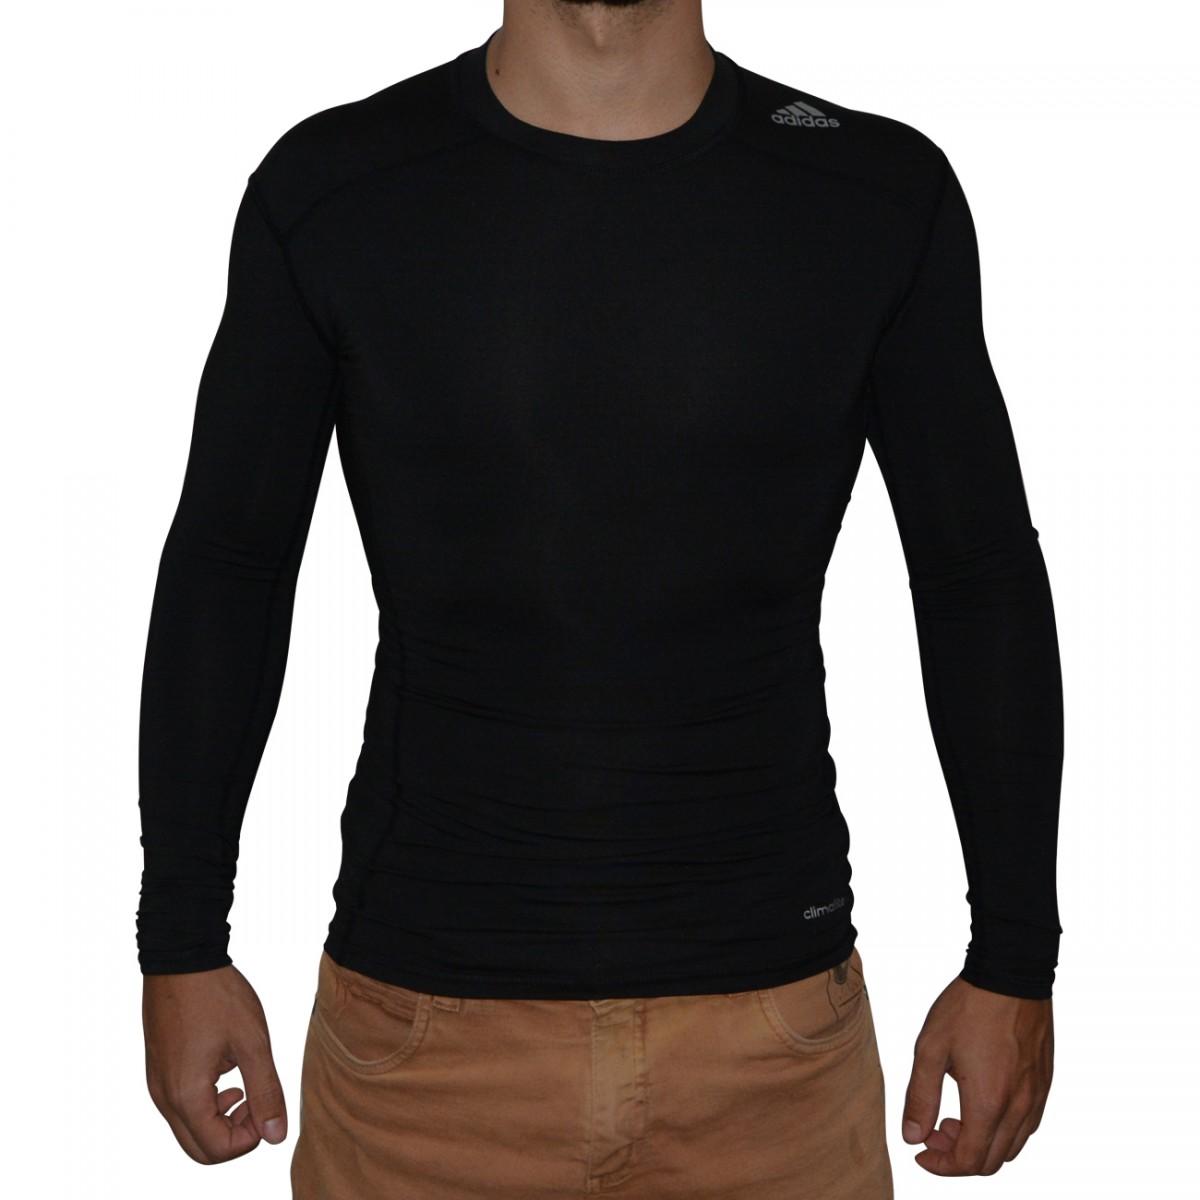 3f7510c856 Camisa Termica Adidas TF Base SL ML AJ5016 - Preto - Chuteira Nike ...